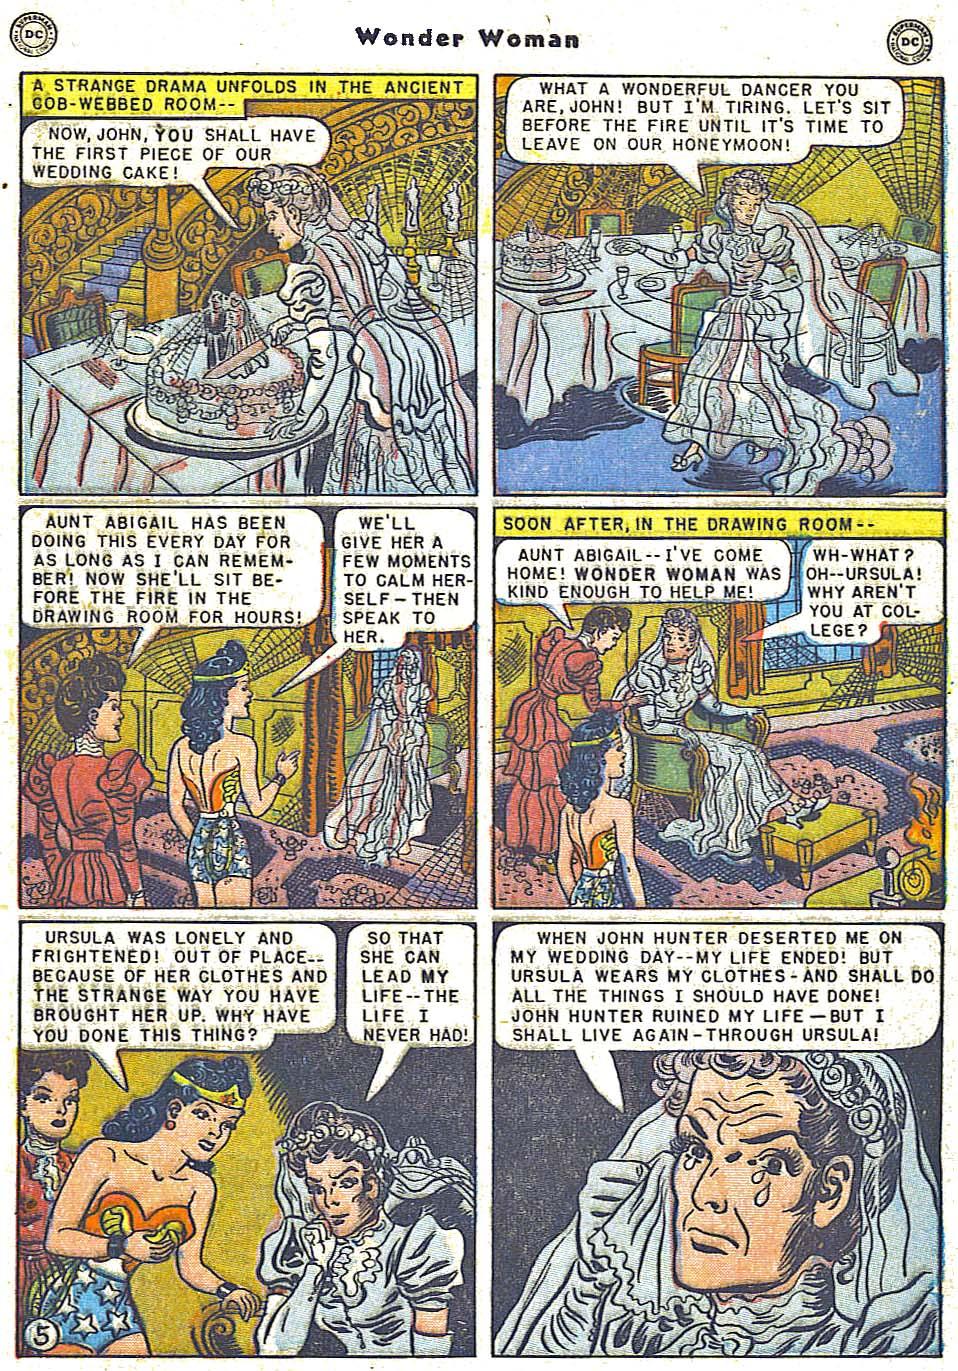 Read online Wonder Woman (1942) comic -  Issue #38 - 7